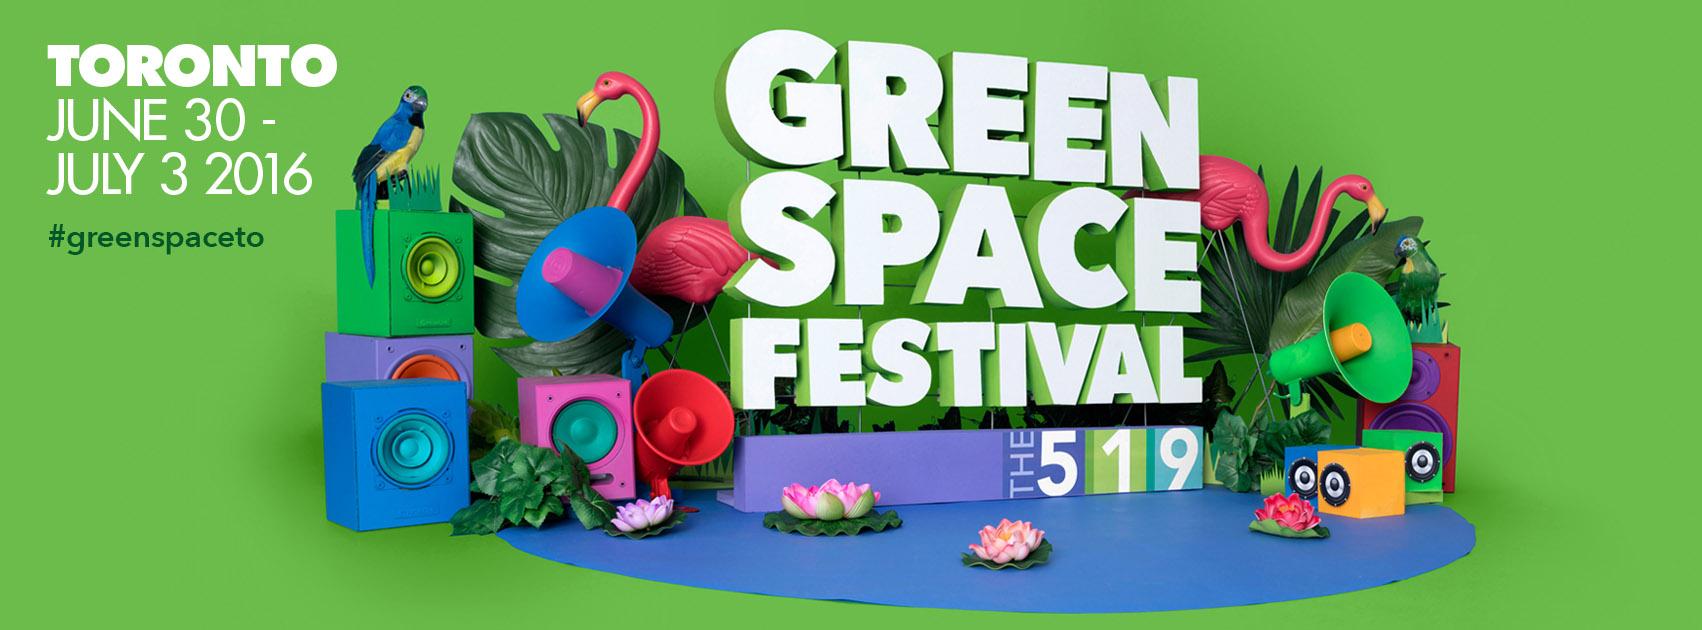 greenspace2016-03